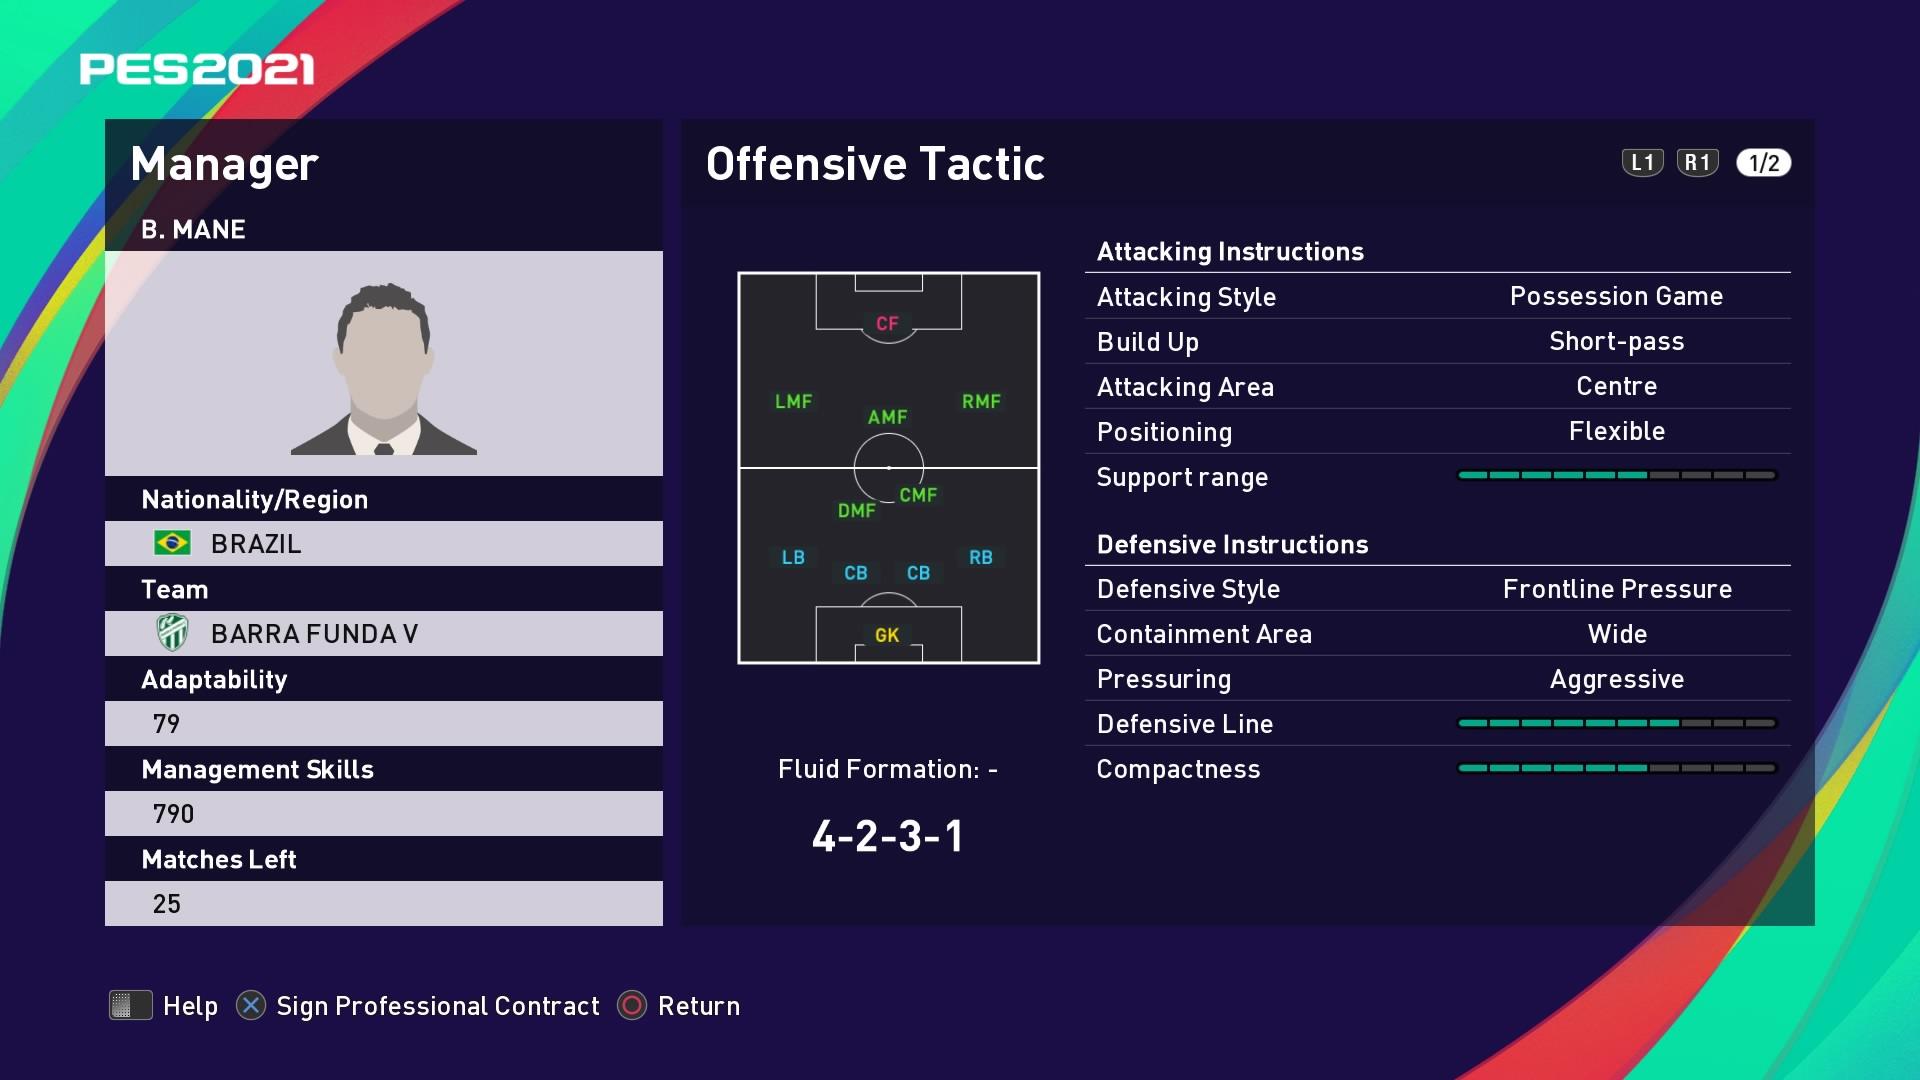 B. Mane (2) (Vanderlei Luxemburgo) Offensive Tactic in PES 2021 myClub